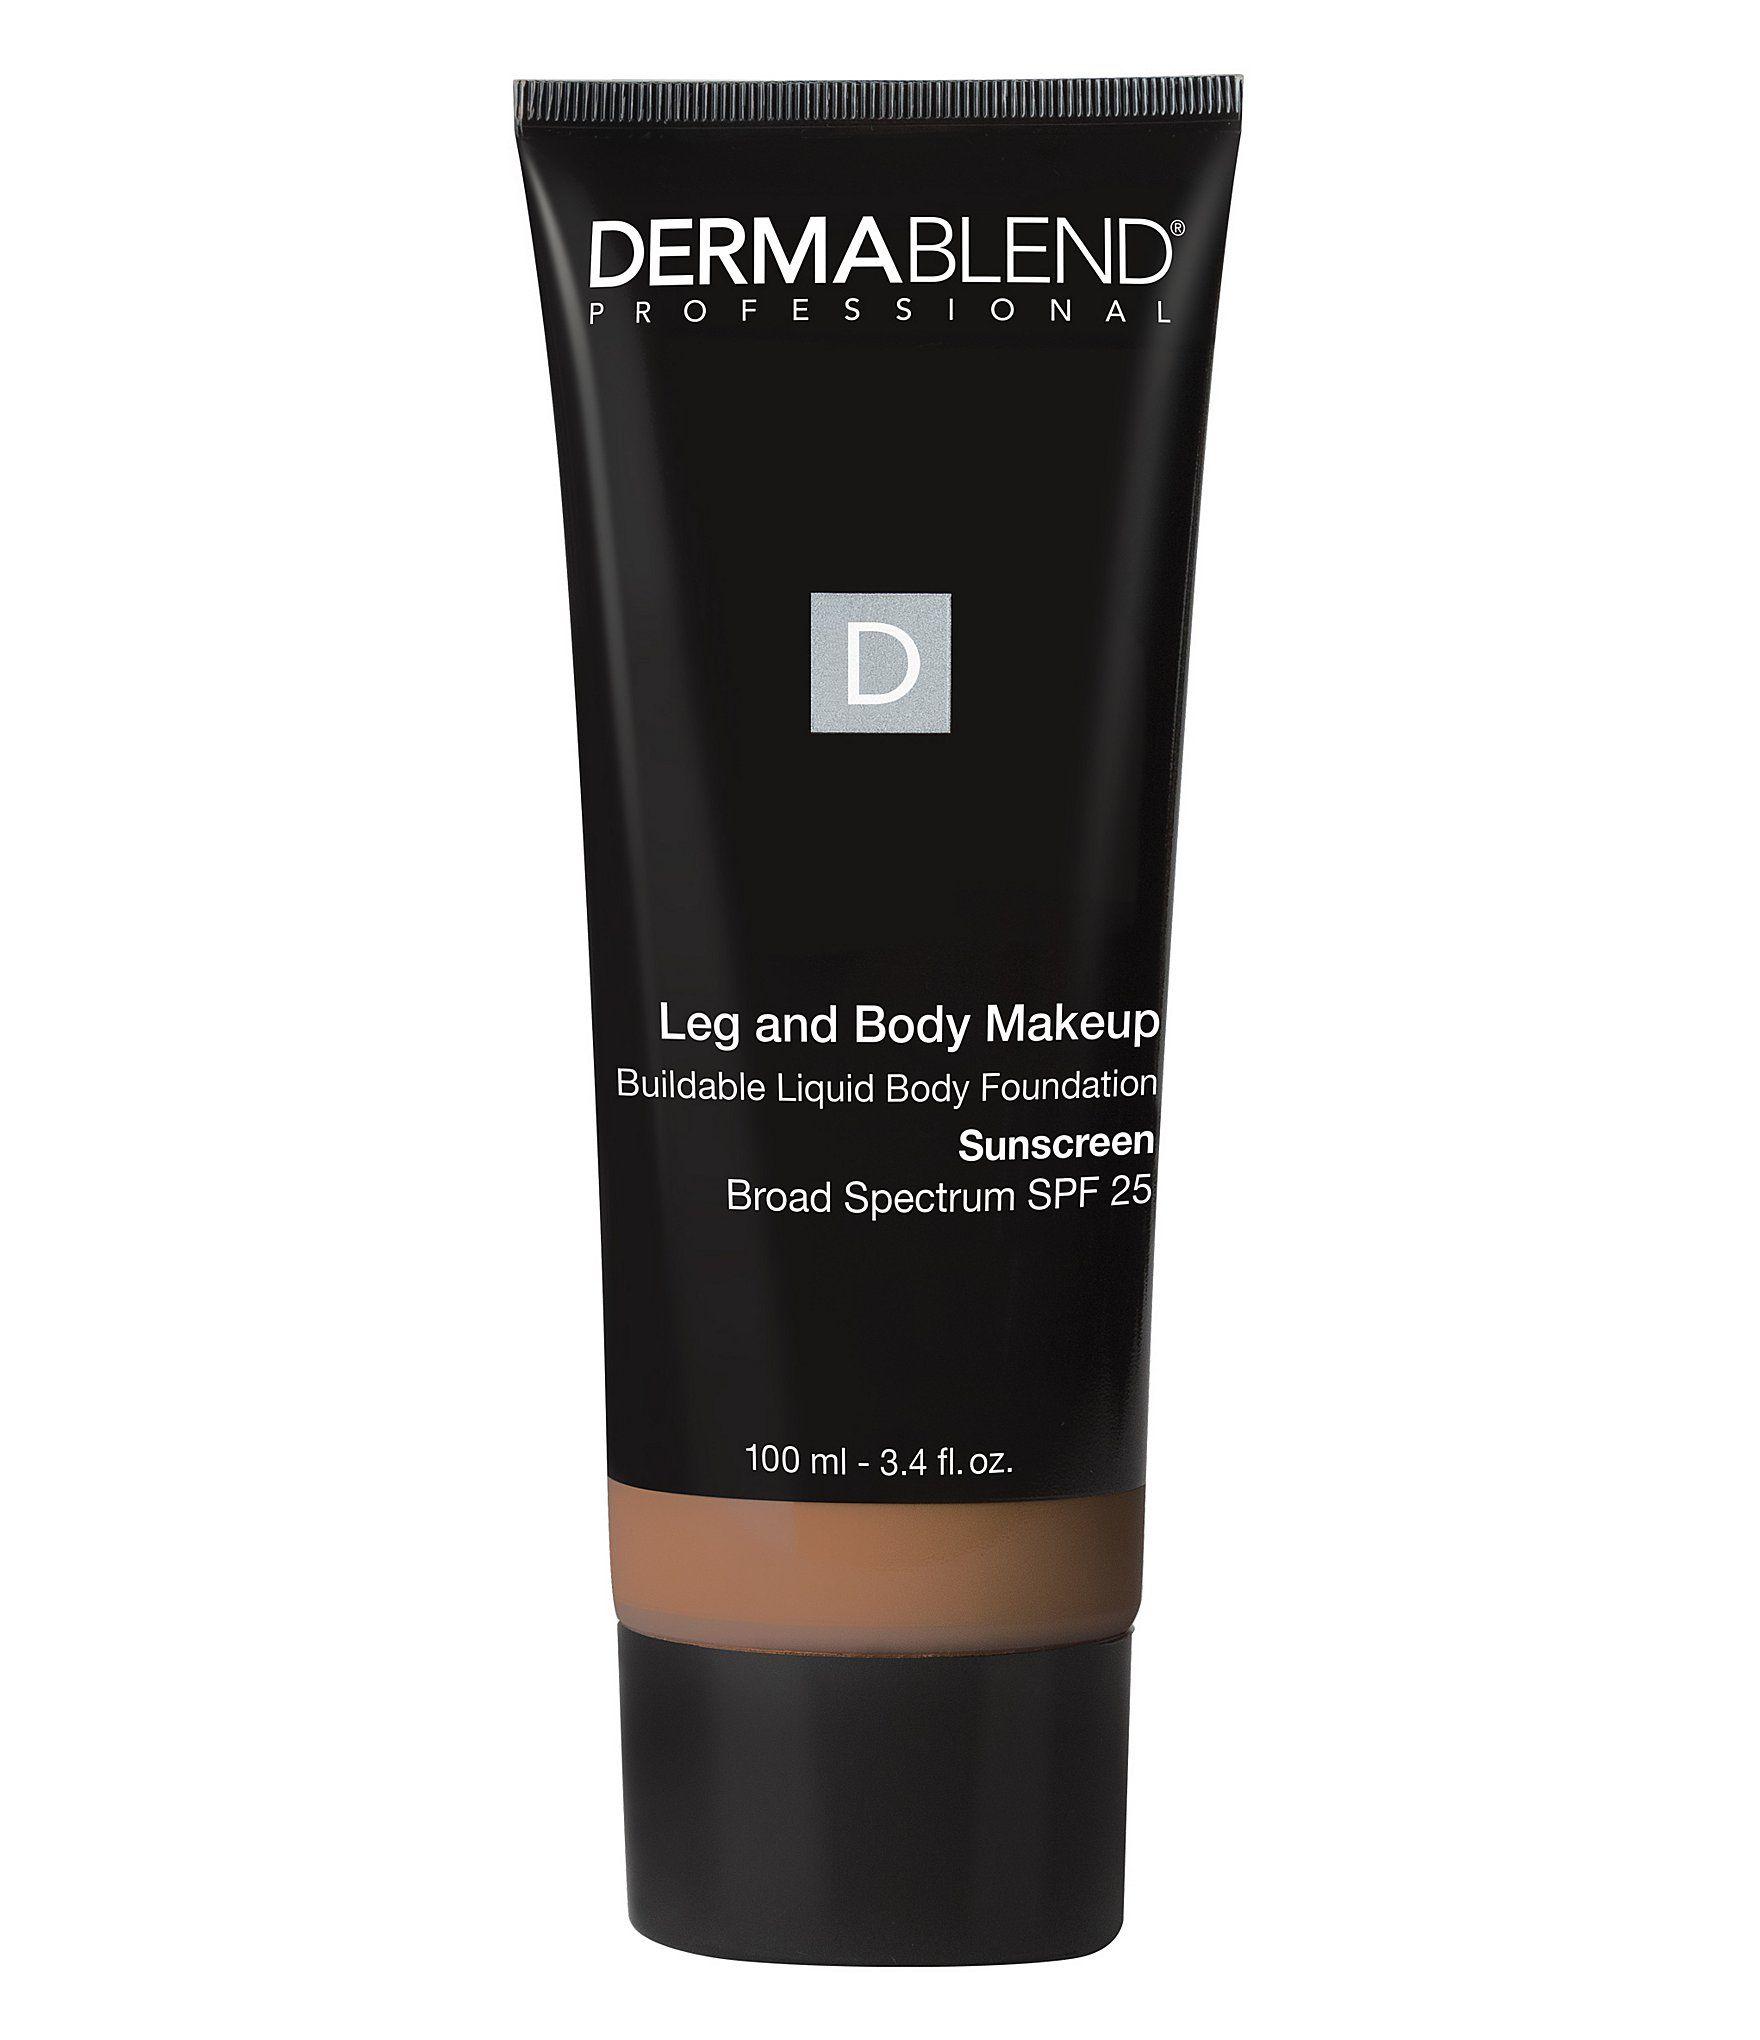 Dermablend Leg & Body Makeup Buildable Liquid Body